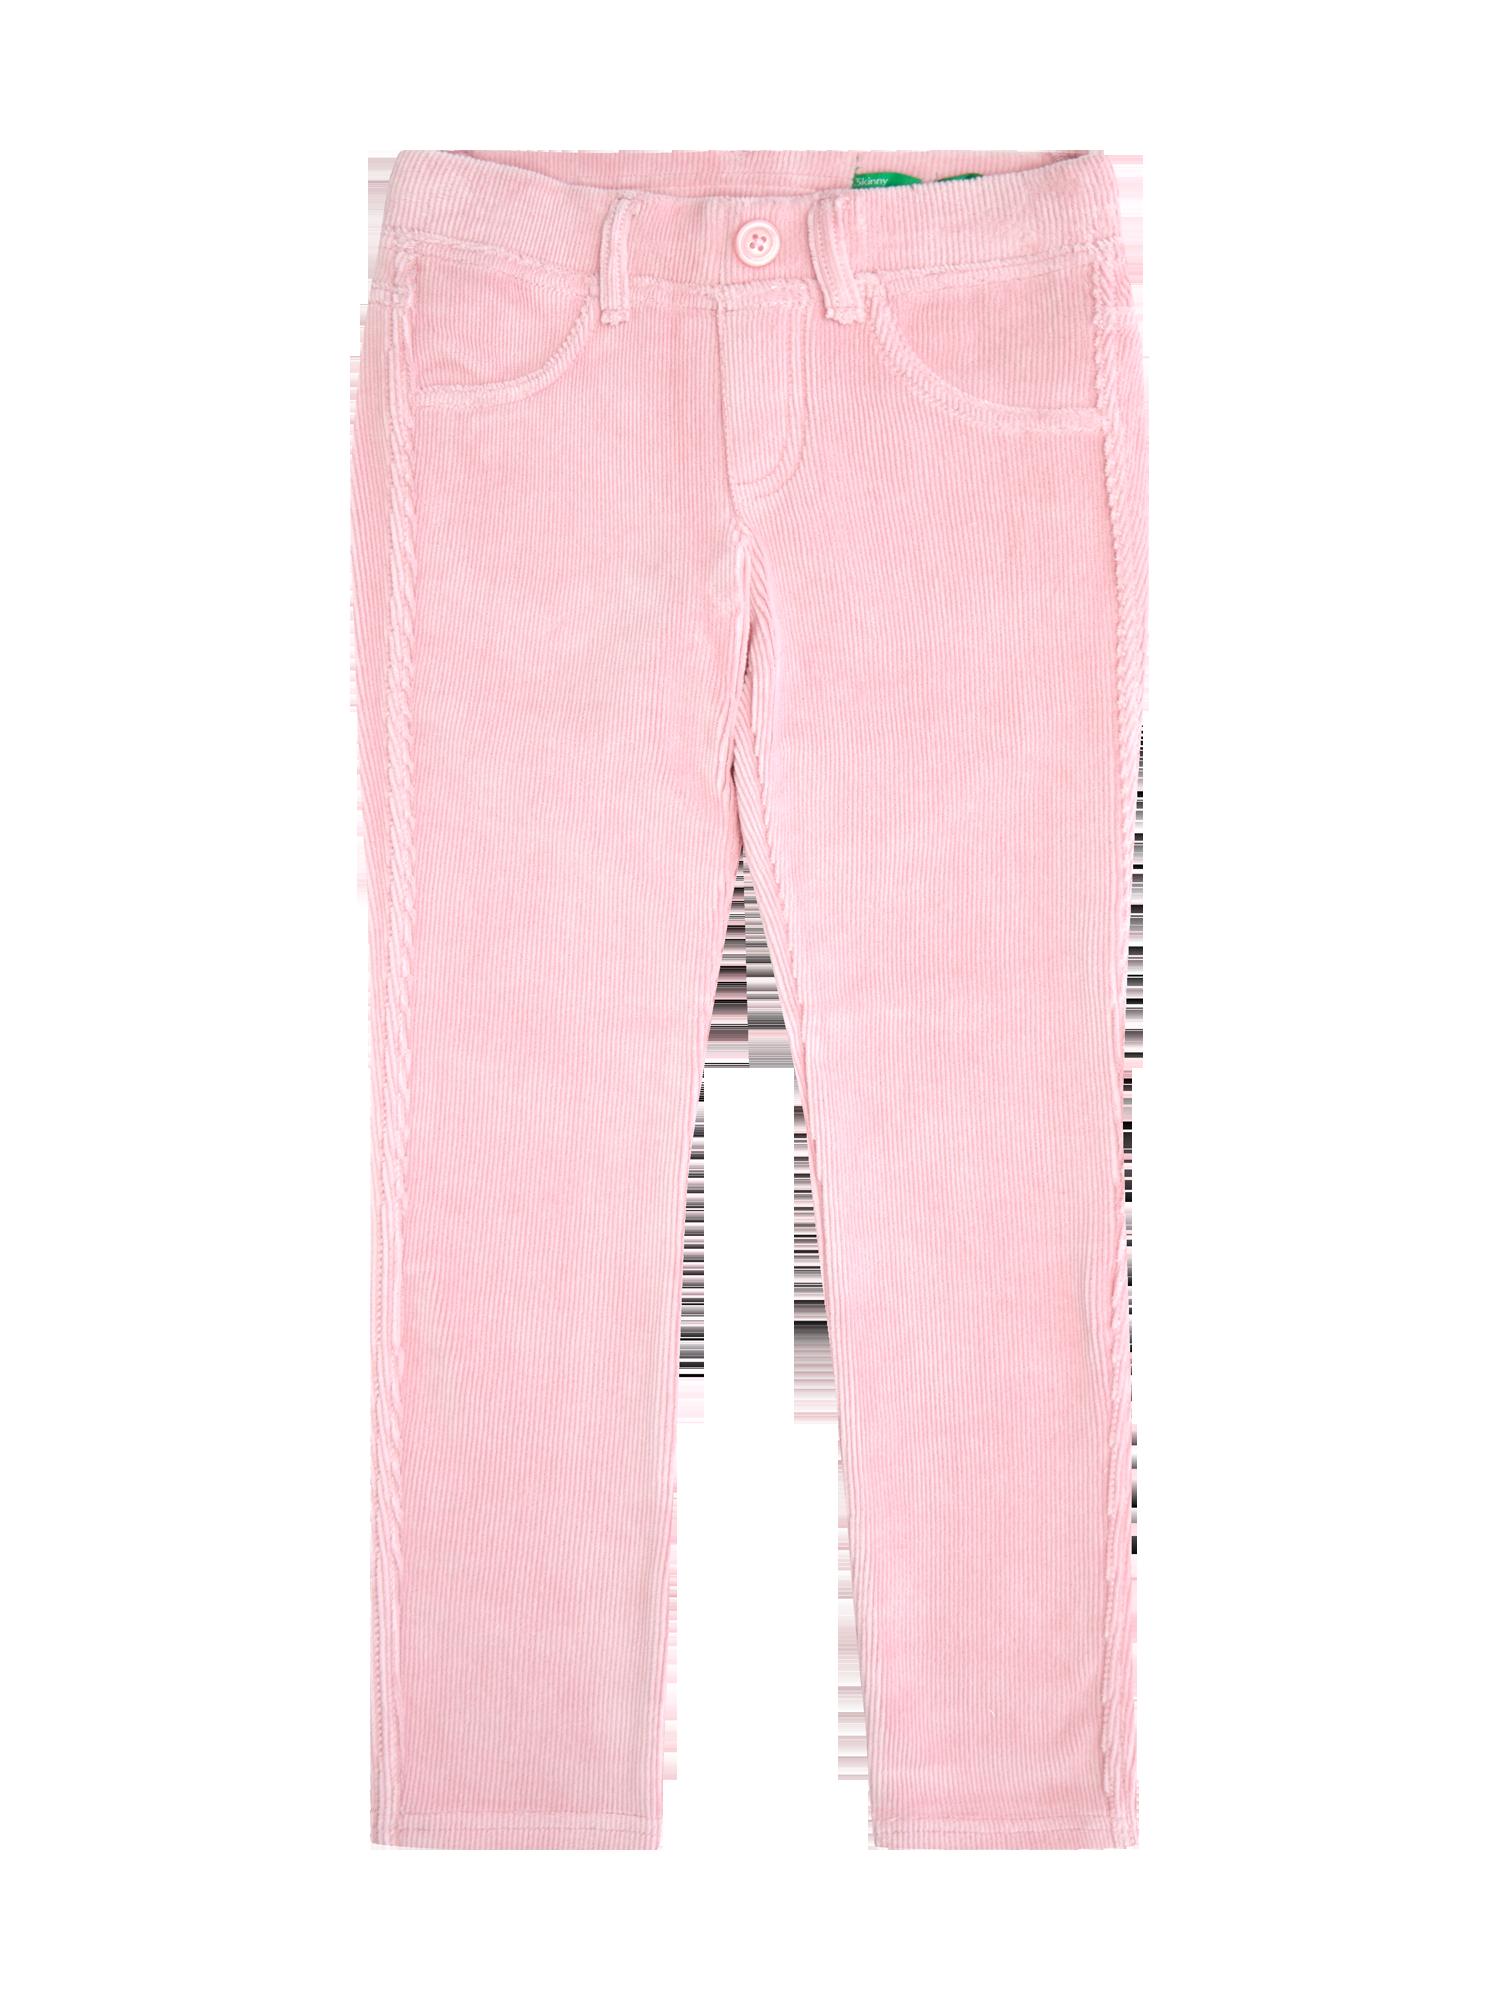 6b1e5f2dfe UNITED-COLORS-OF-BENETTON Skinny Fit Treggings aus weichem Cord in Rosé online  kaufen (9271904) ▷ P&C Online Shop